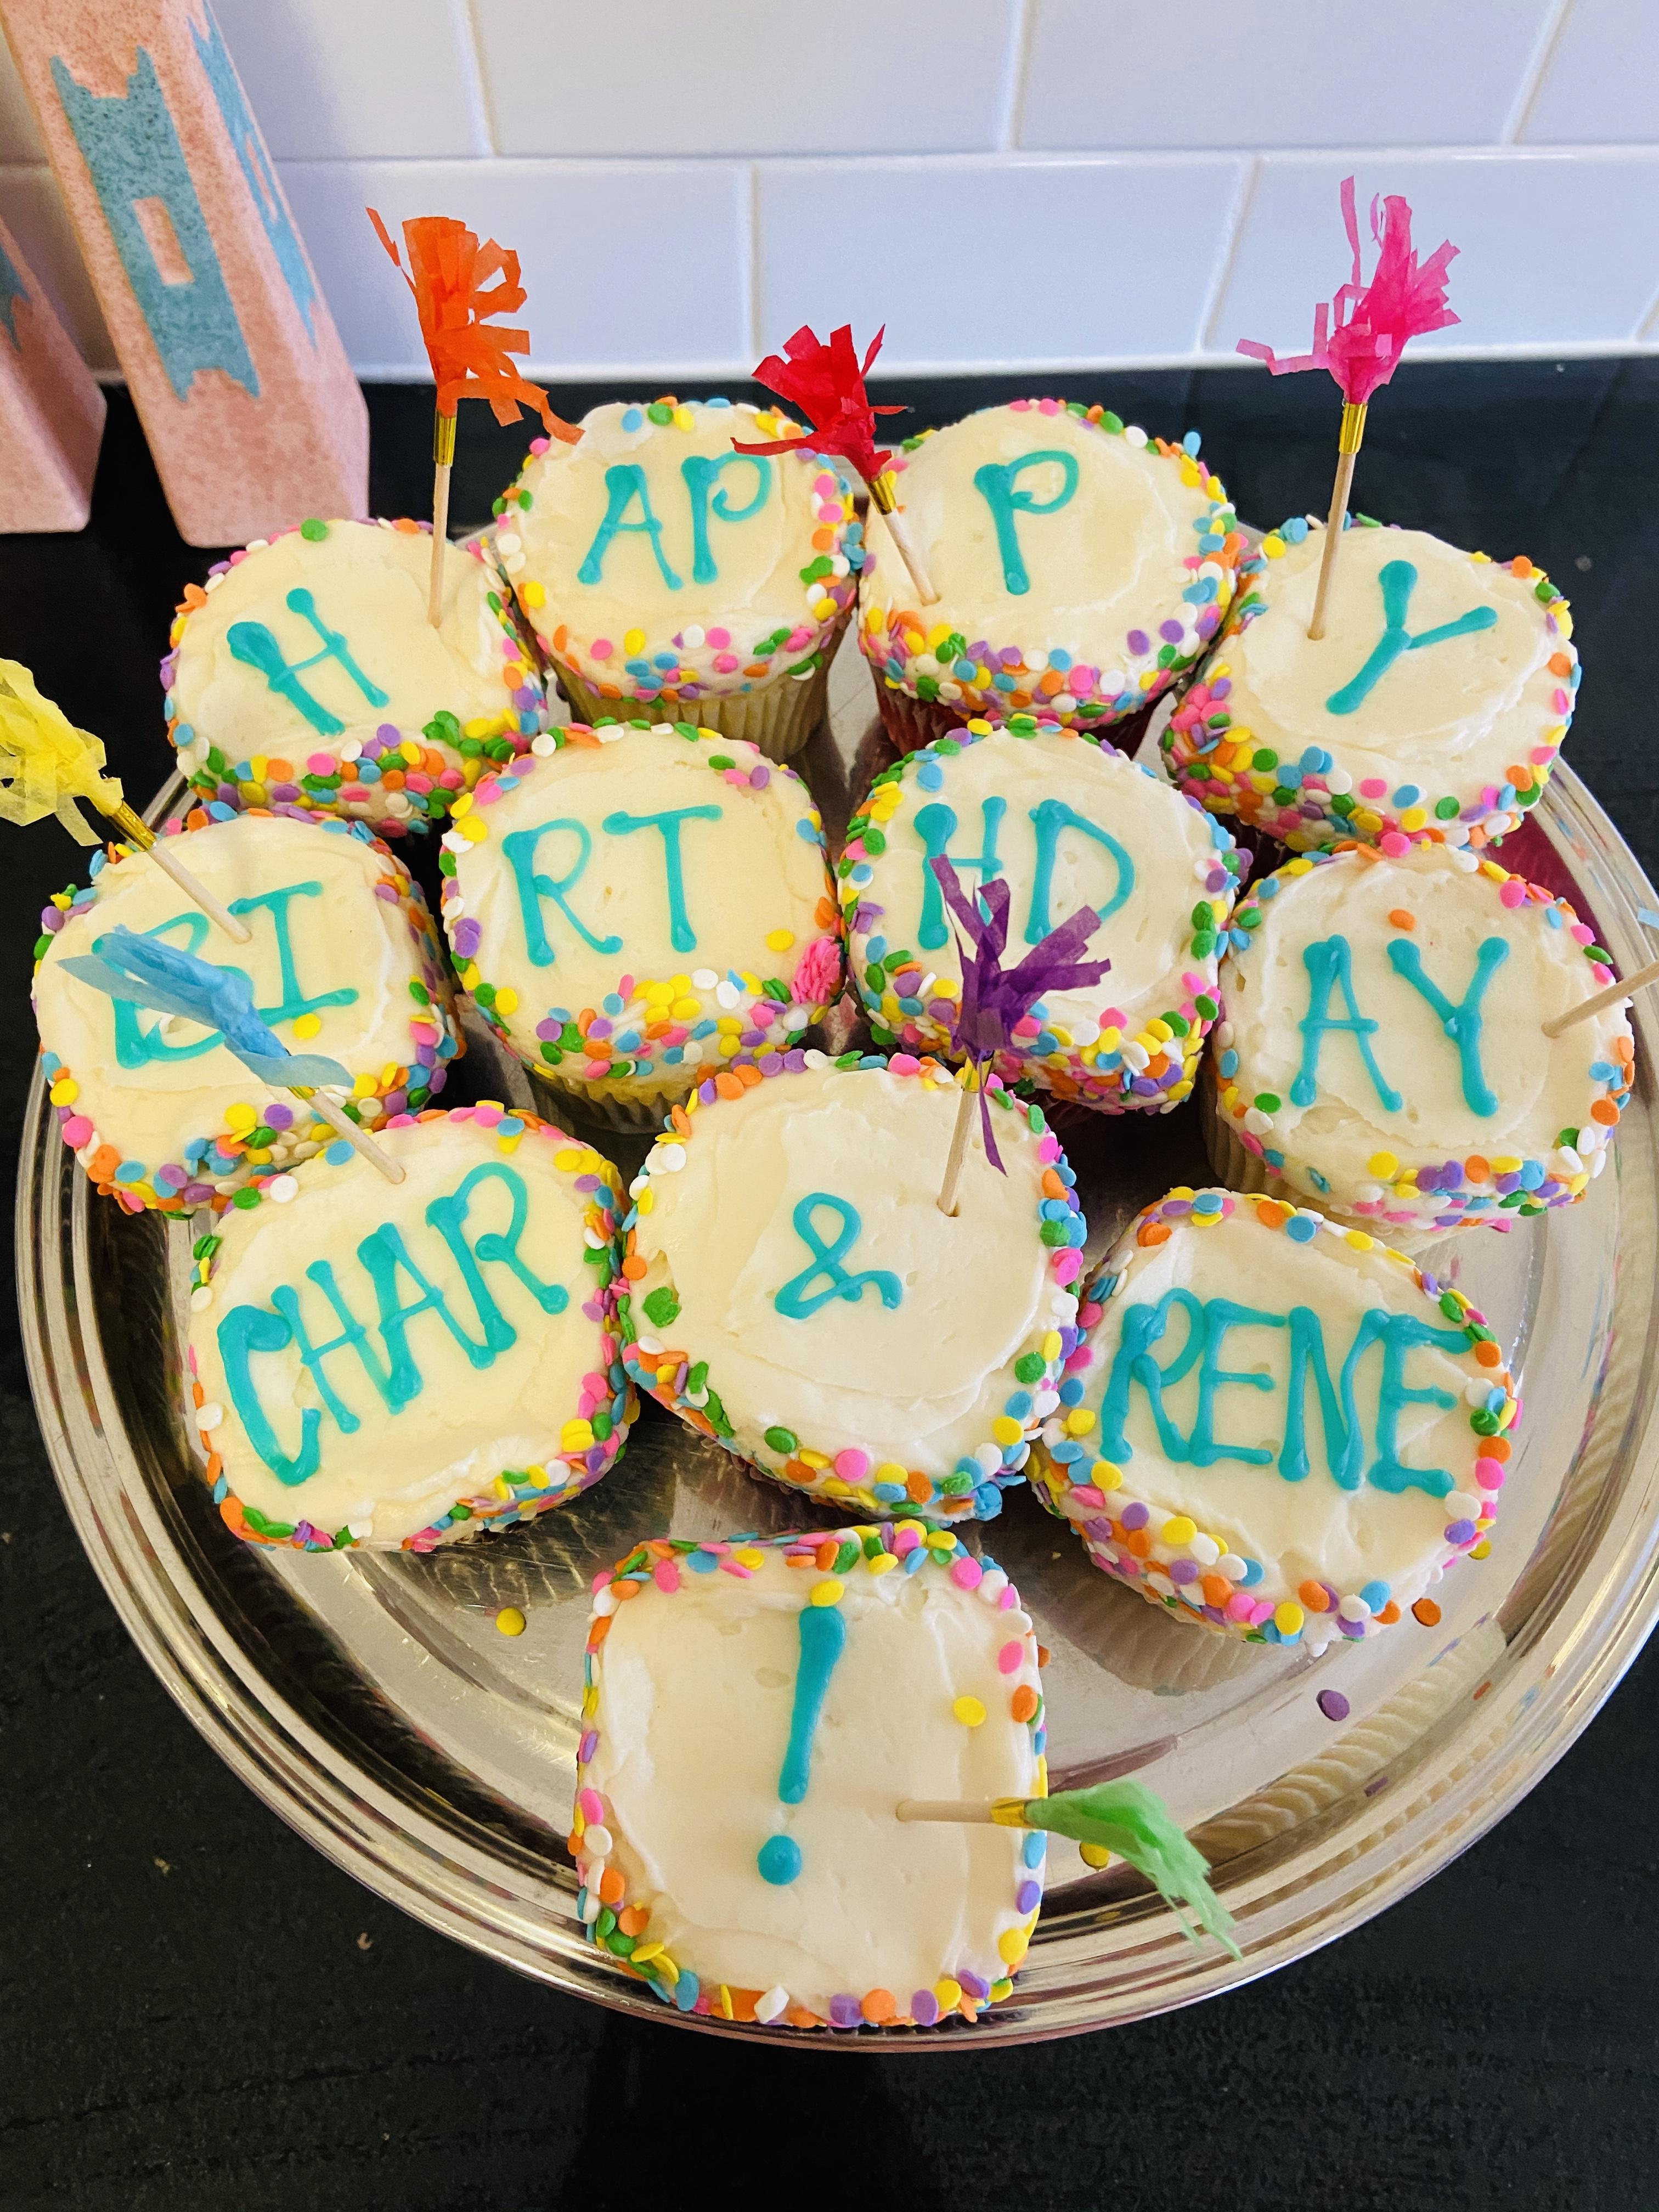 27th birthday cake